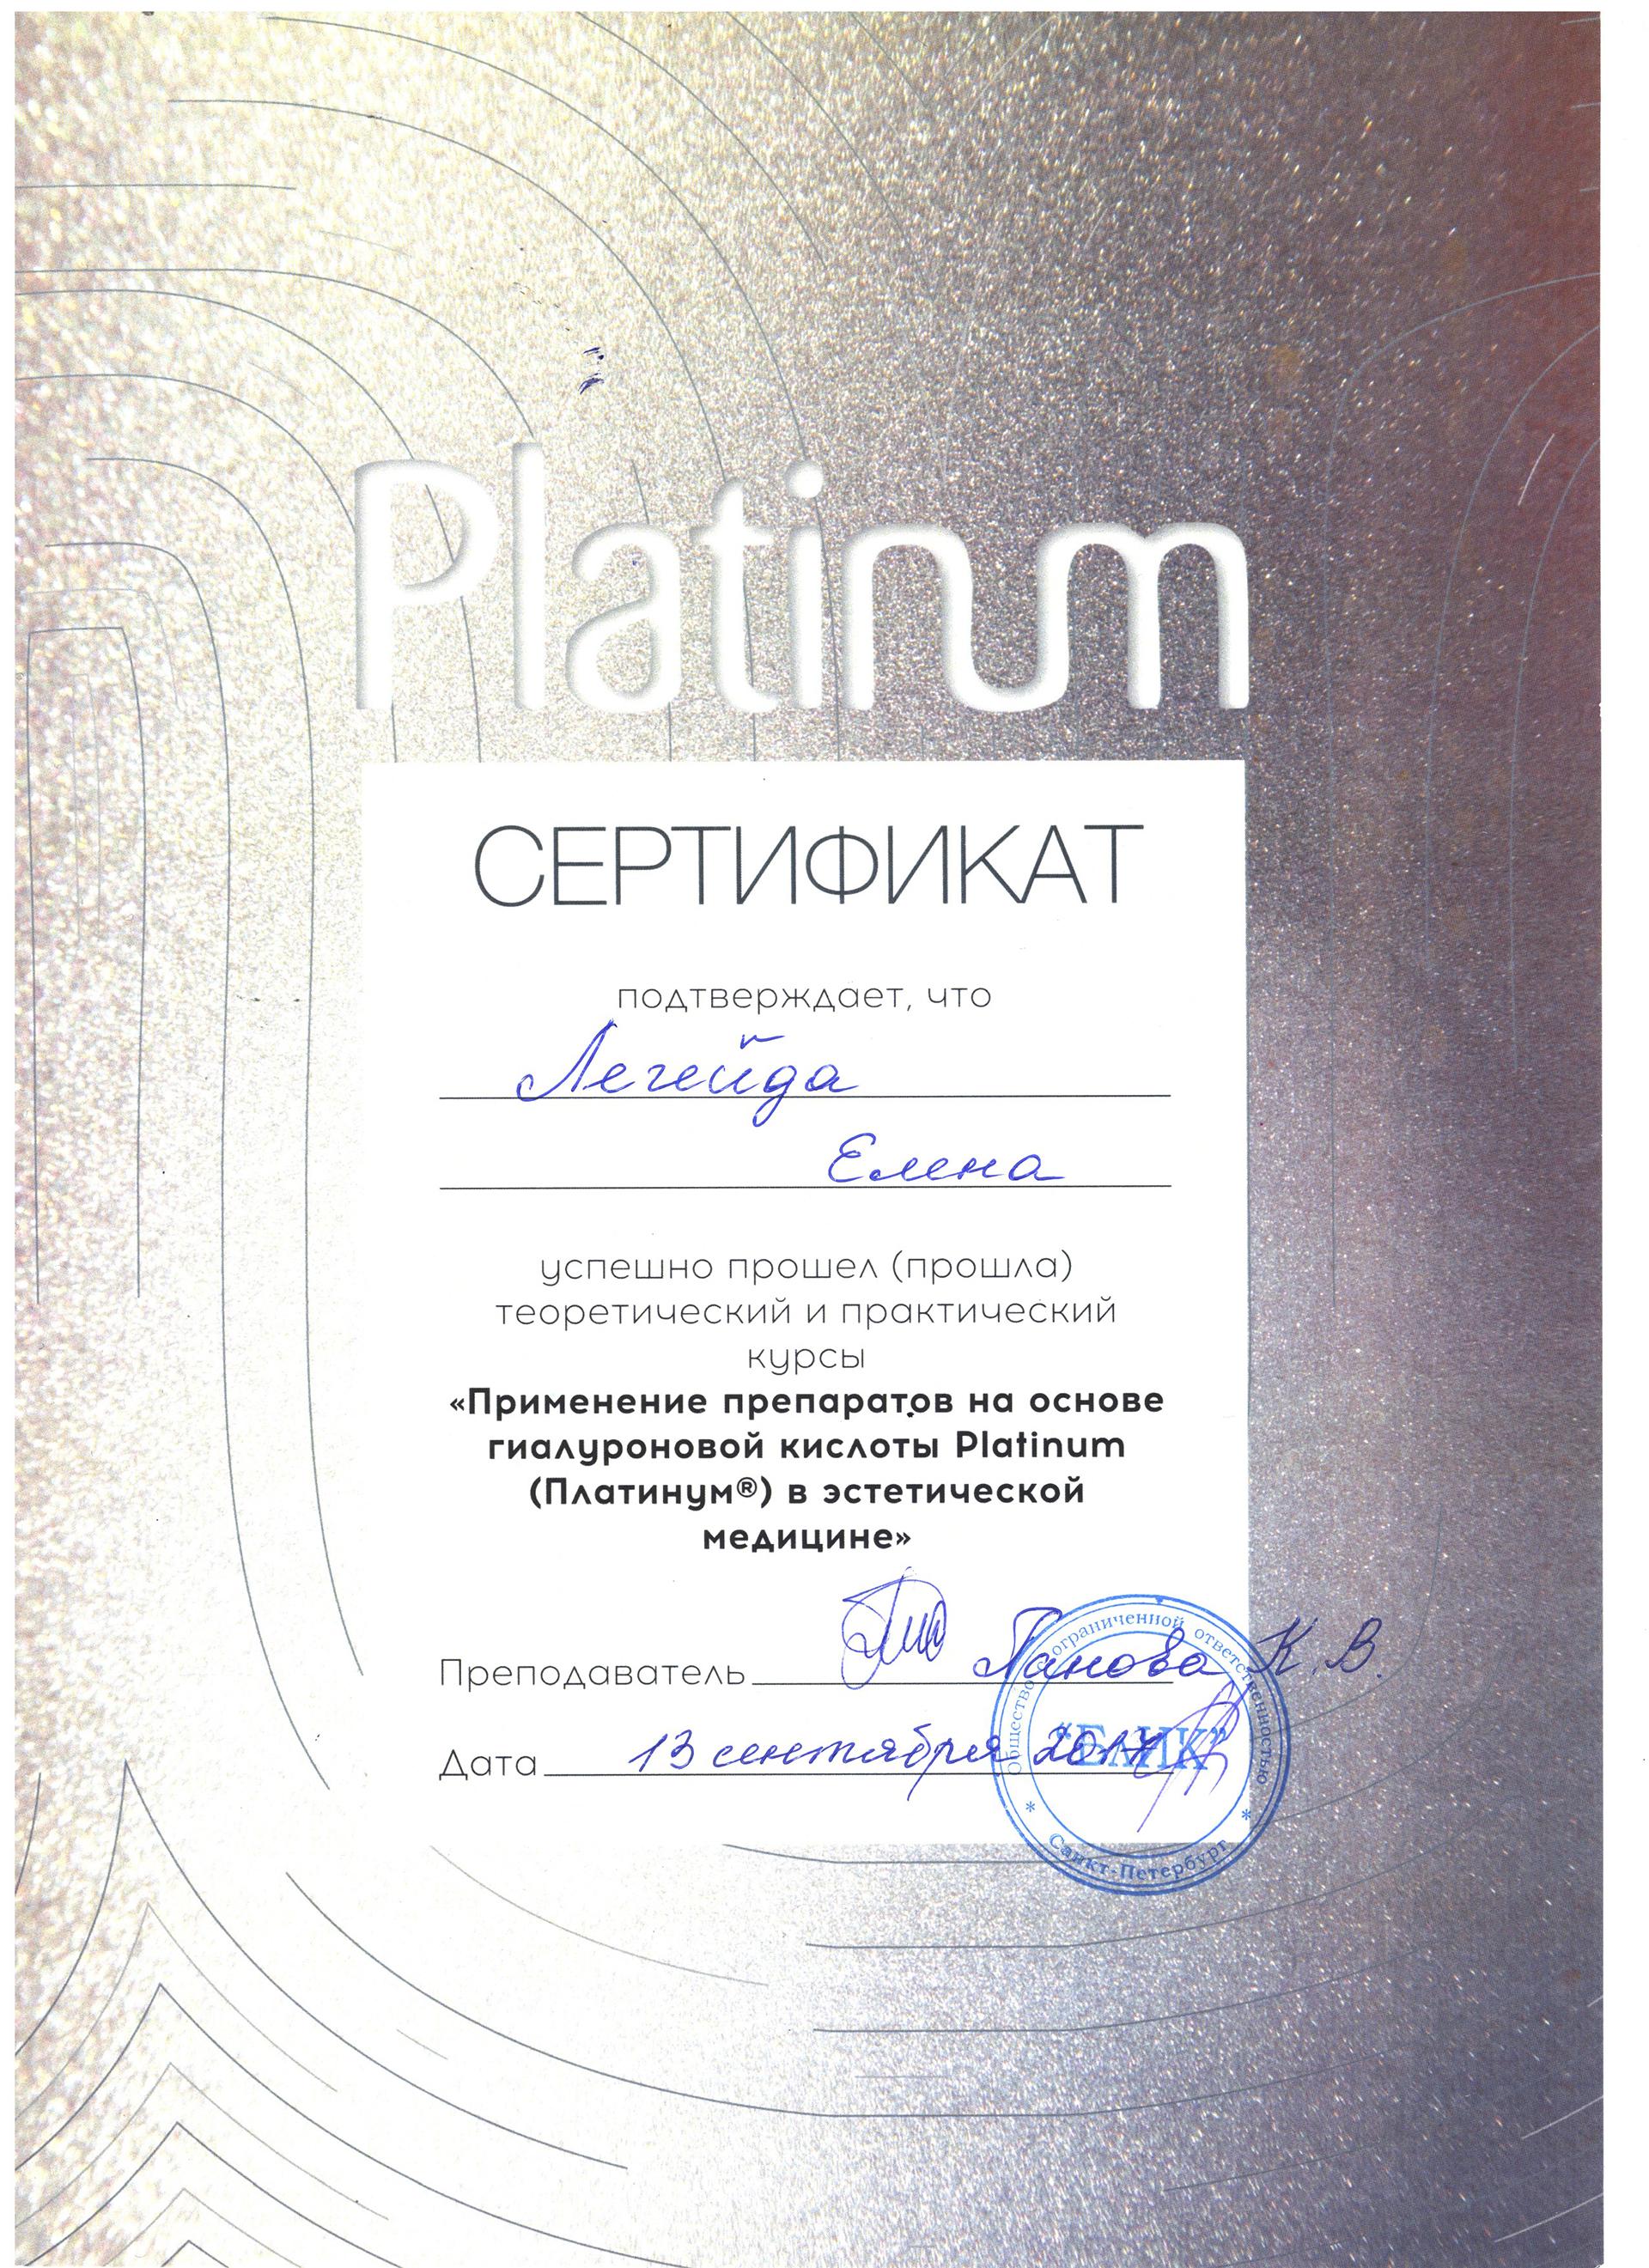 Сертификат — Применение препарата Platinum. Легейда Елена Валерьевна